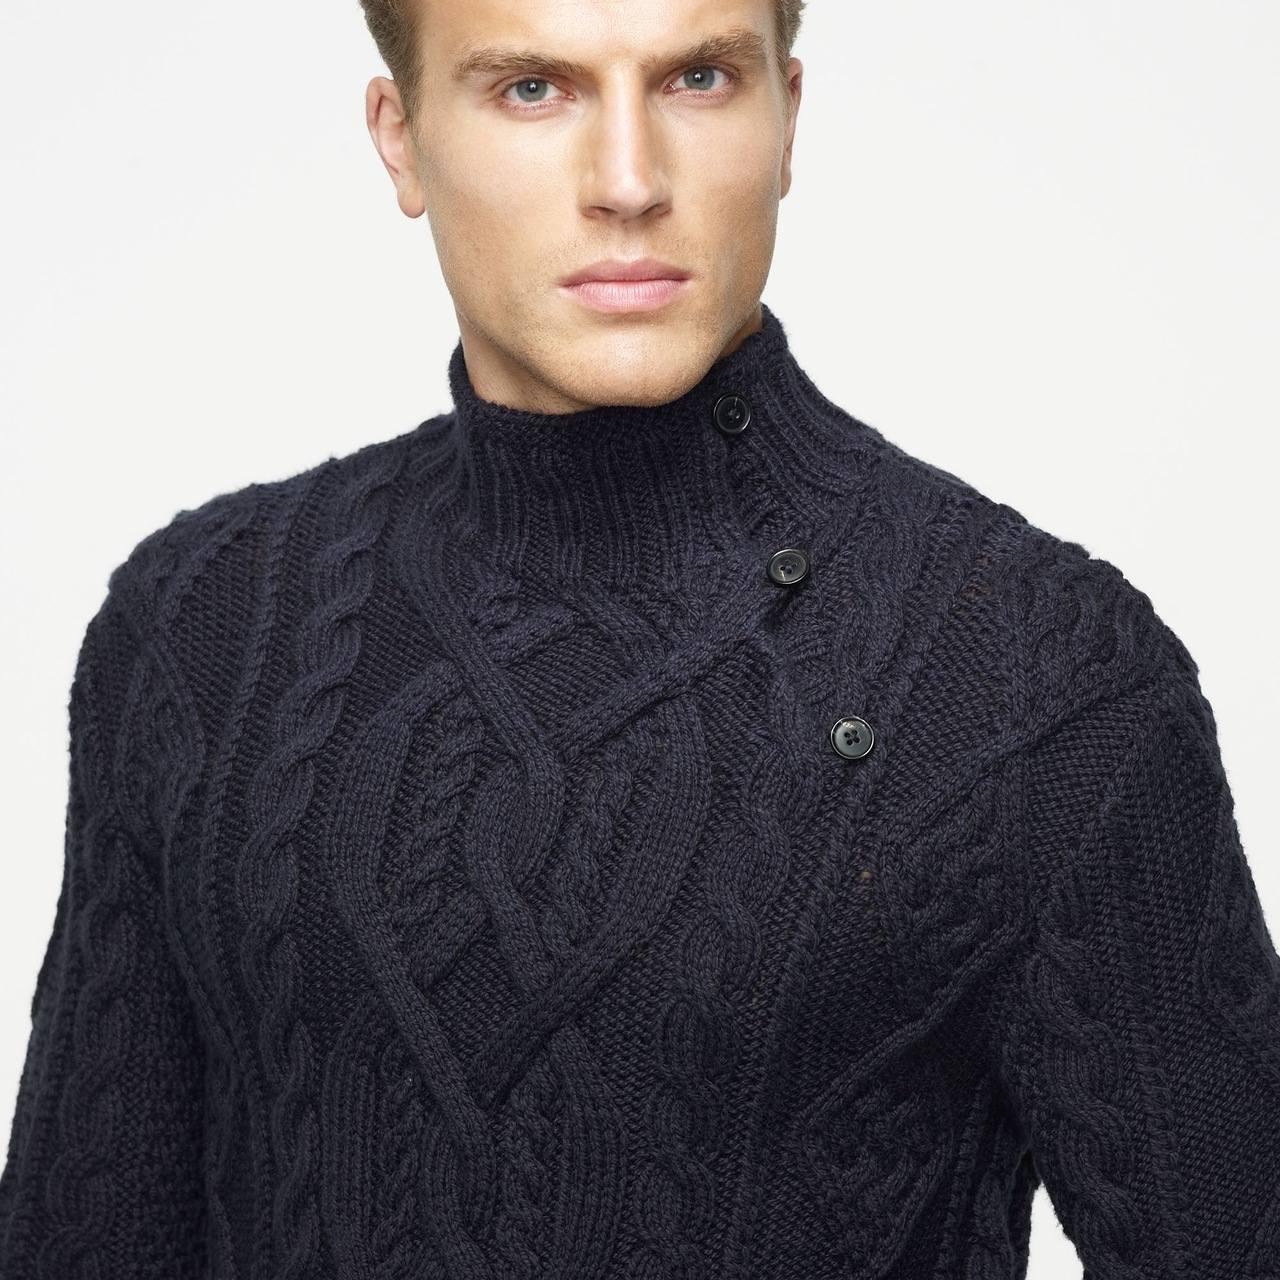 Temporarylux свитера для мужчин спицами